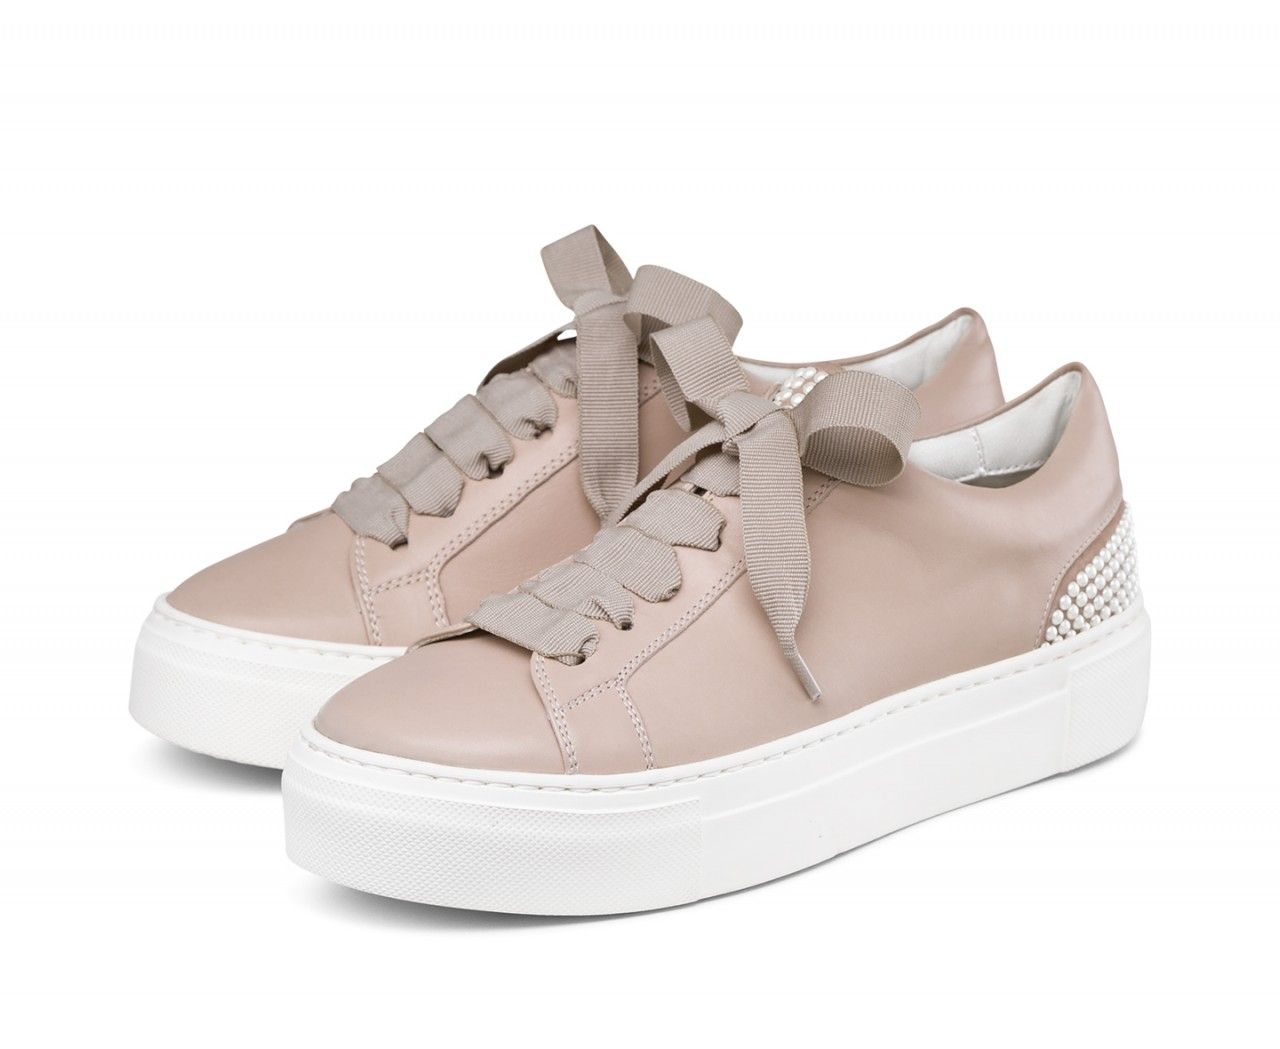 Girly sneakers | Girly sneakers